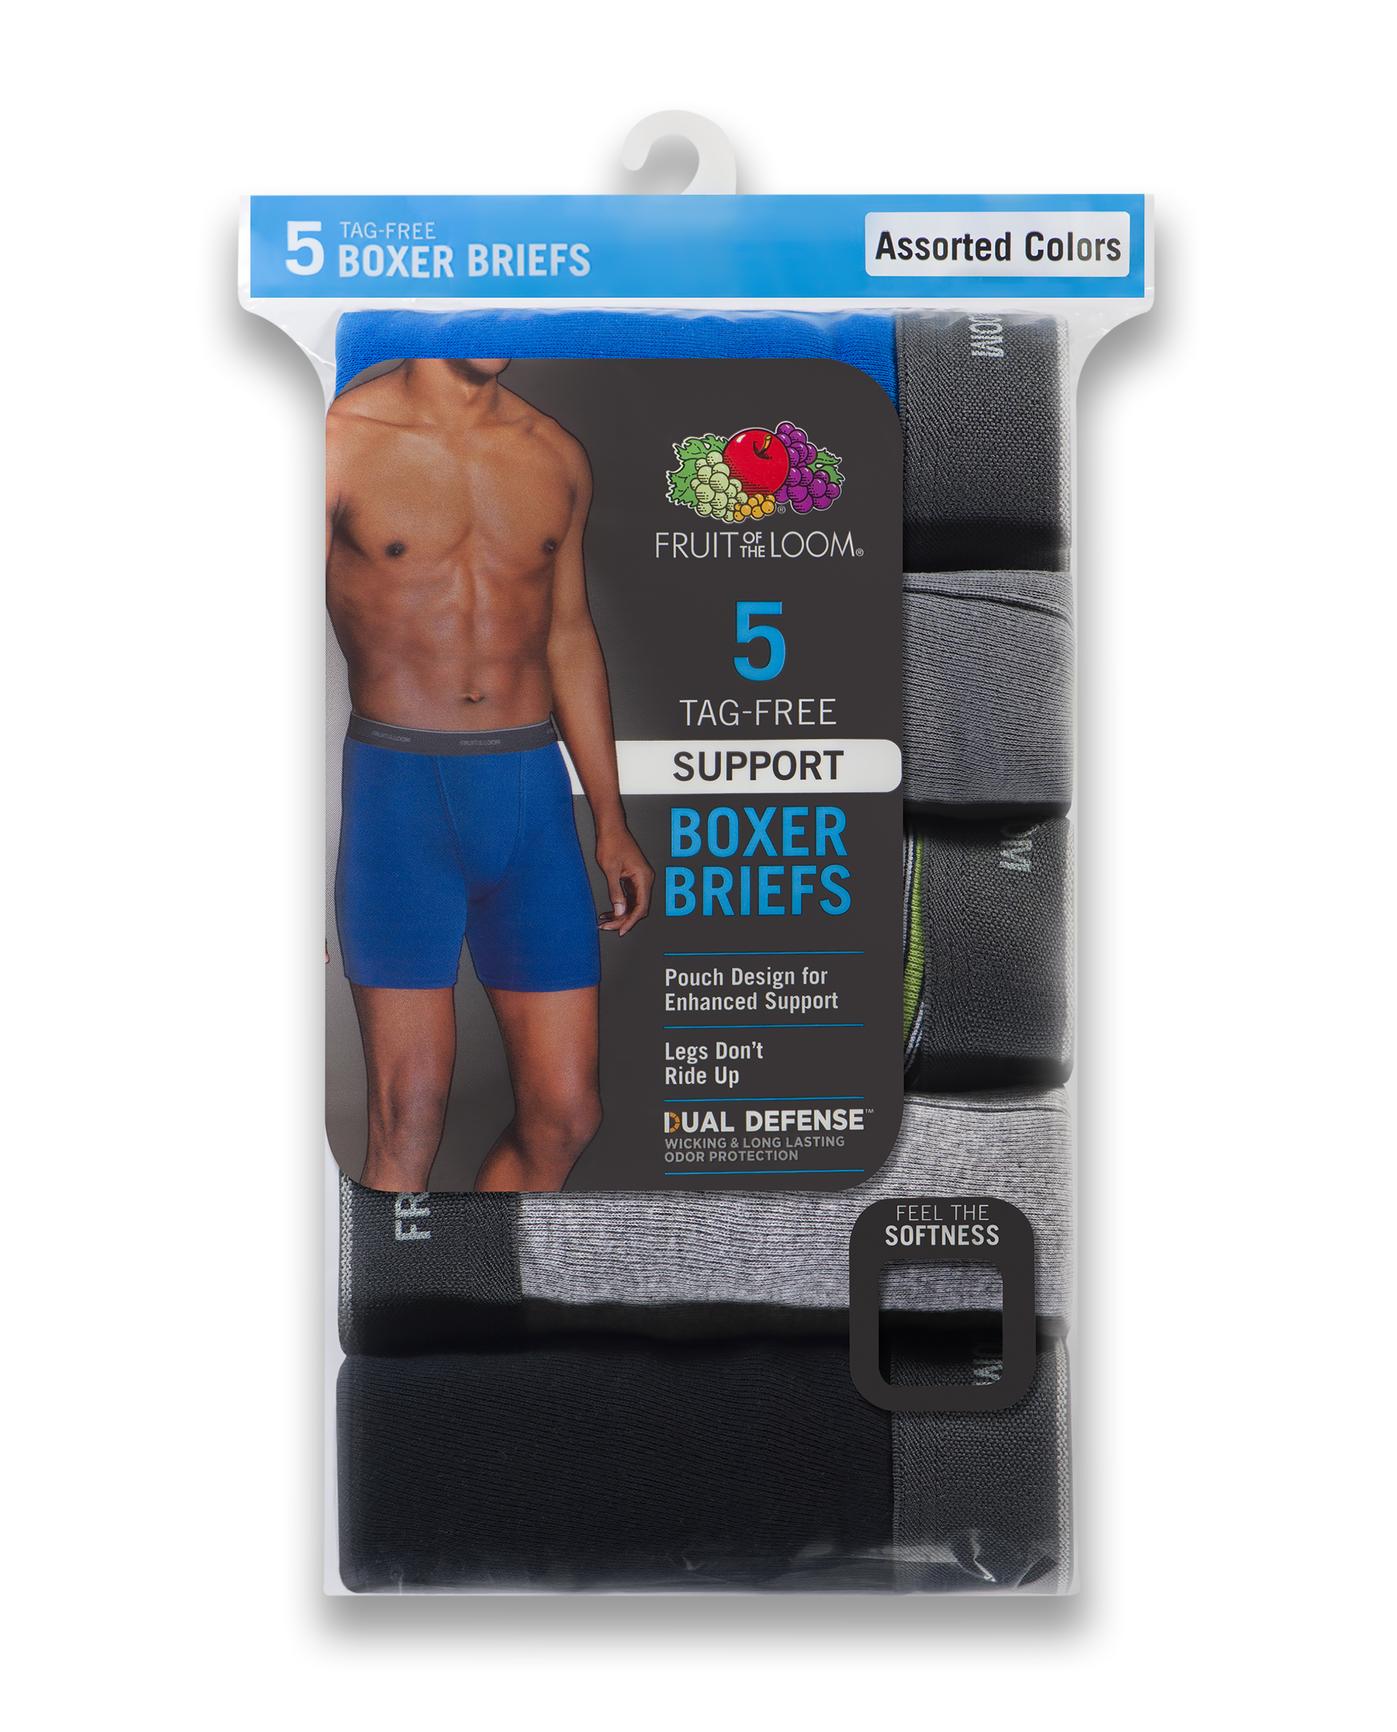 Men's Support Pouch Assorted Dual Defense Boxer Briefs, 5